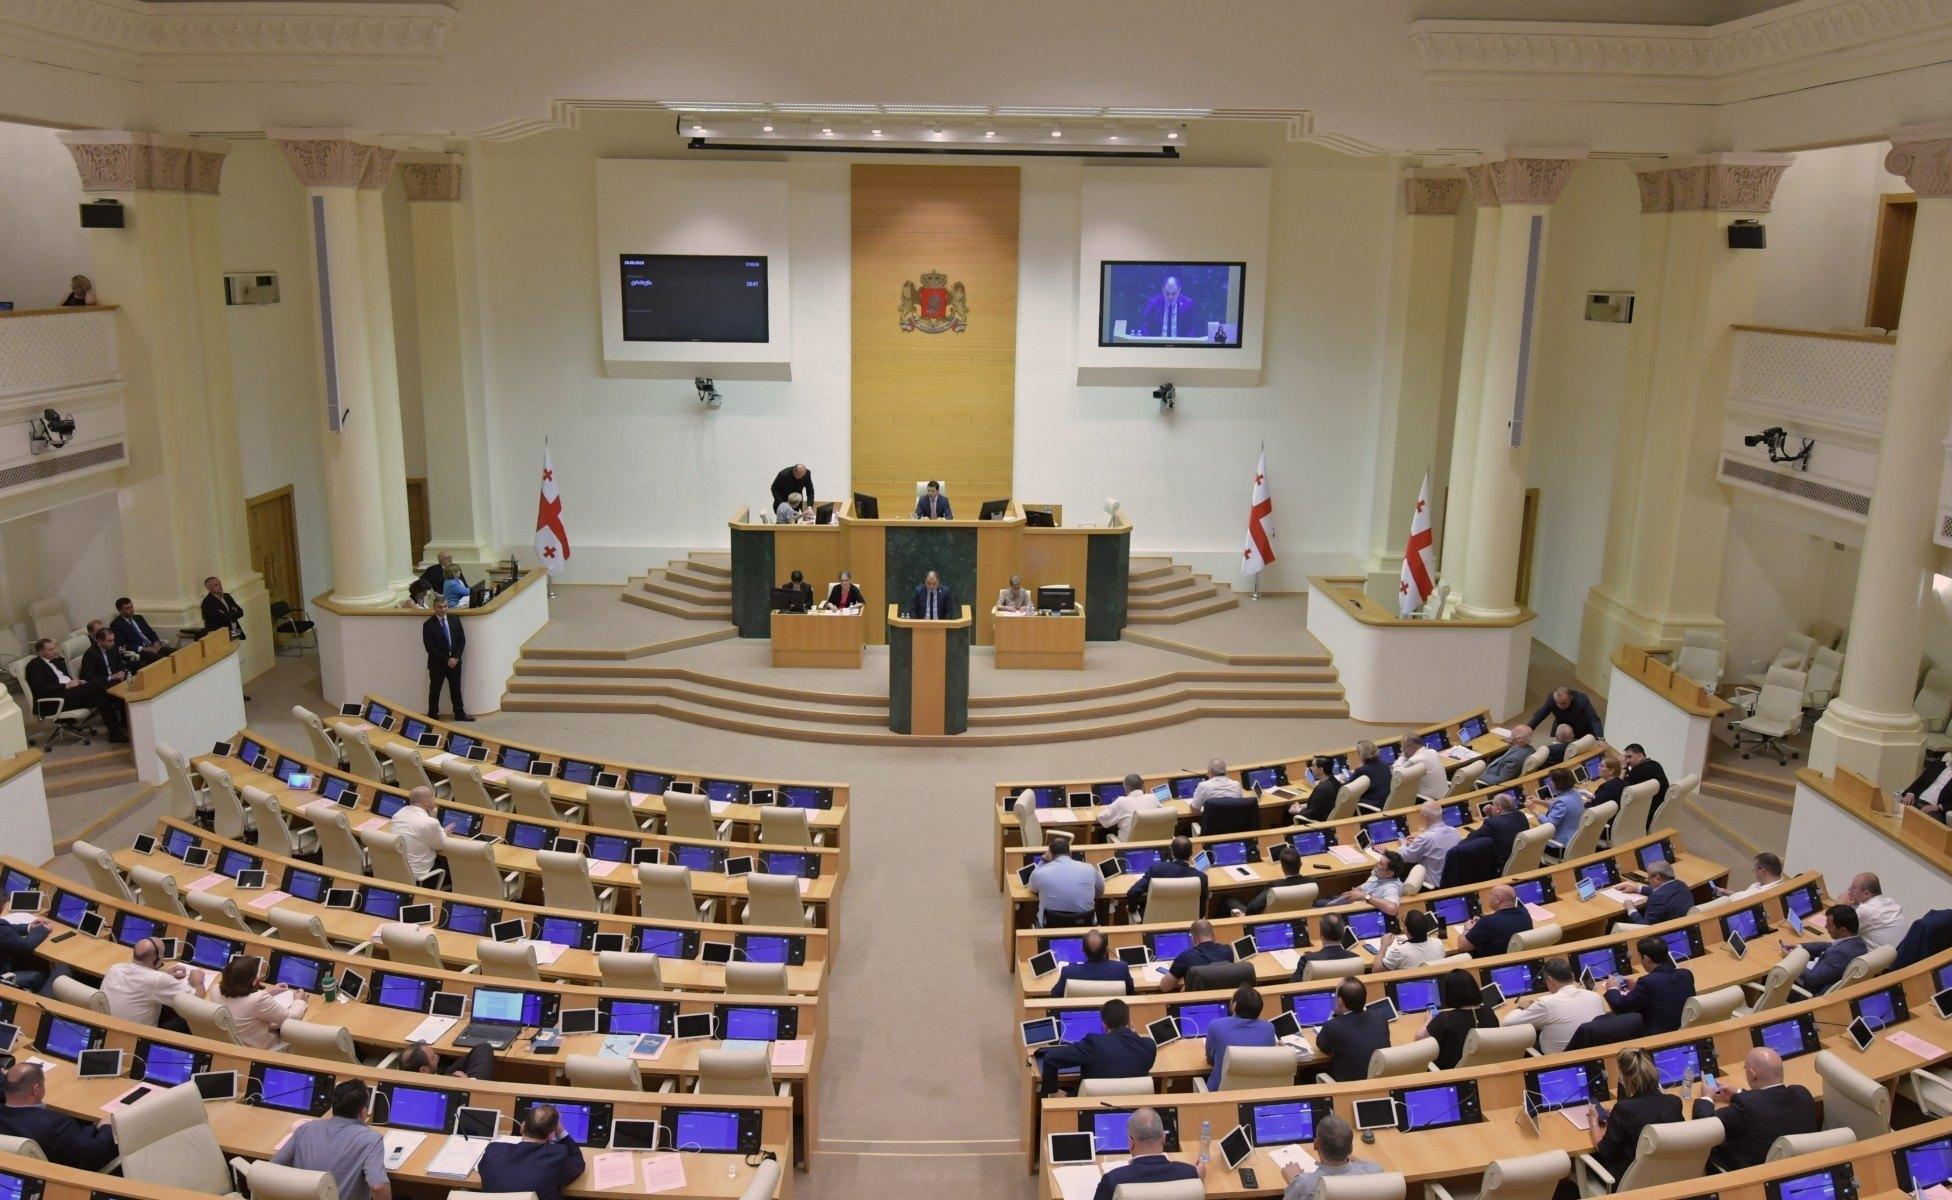 Parliament 4 «Альянс патриотов» «Альянс патриотов»